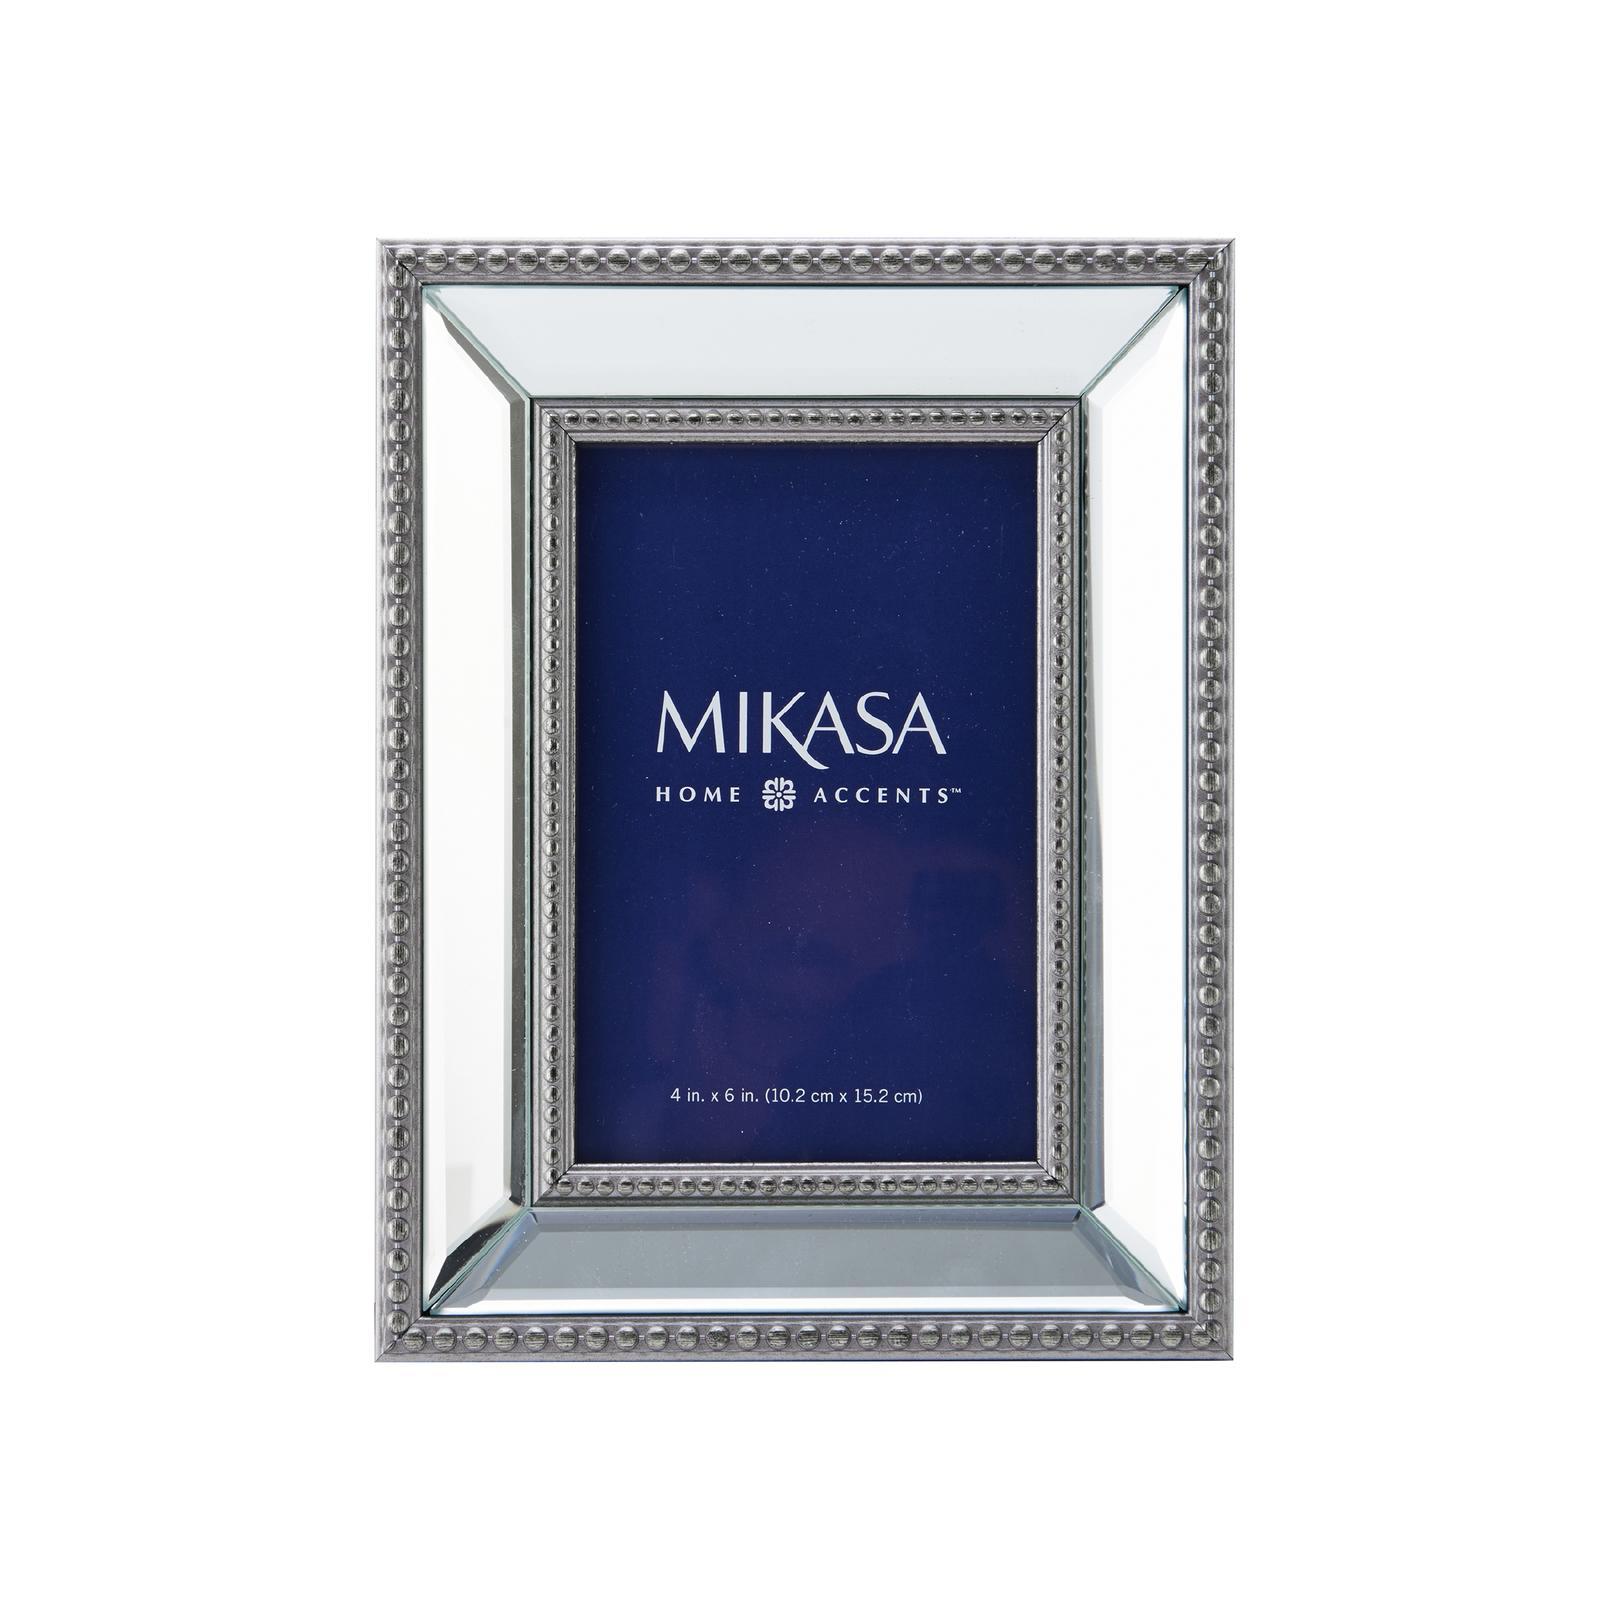 "Mikasa 4""x6"" PS Bead Mirror Frame PartNumber: 02414470000P KsnValue: 6039893 MfgPartNumber: 5151000"